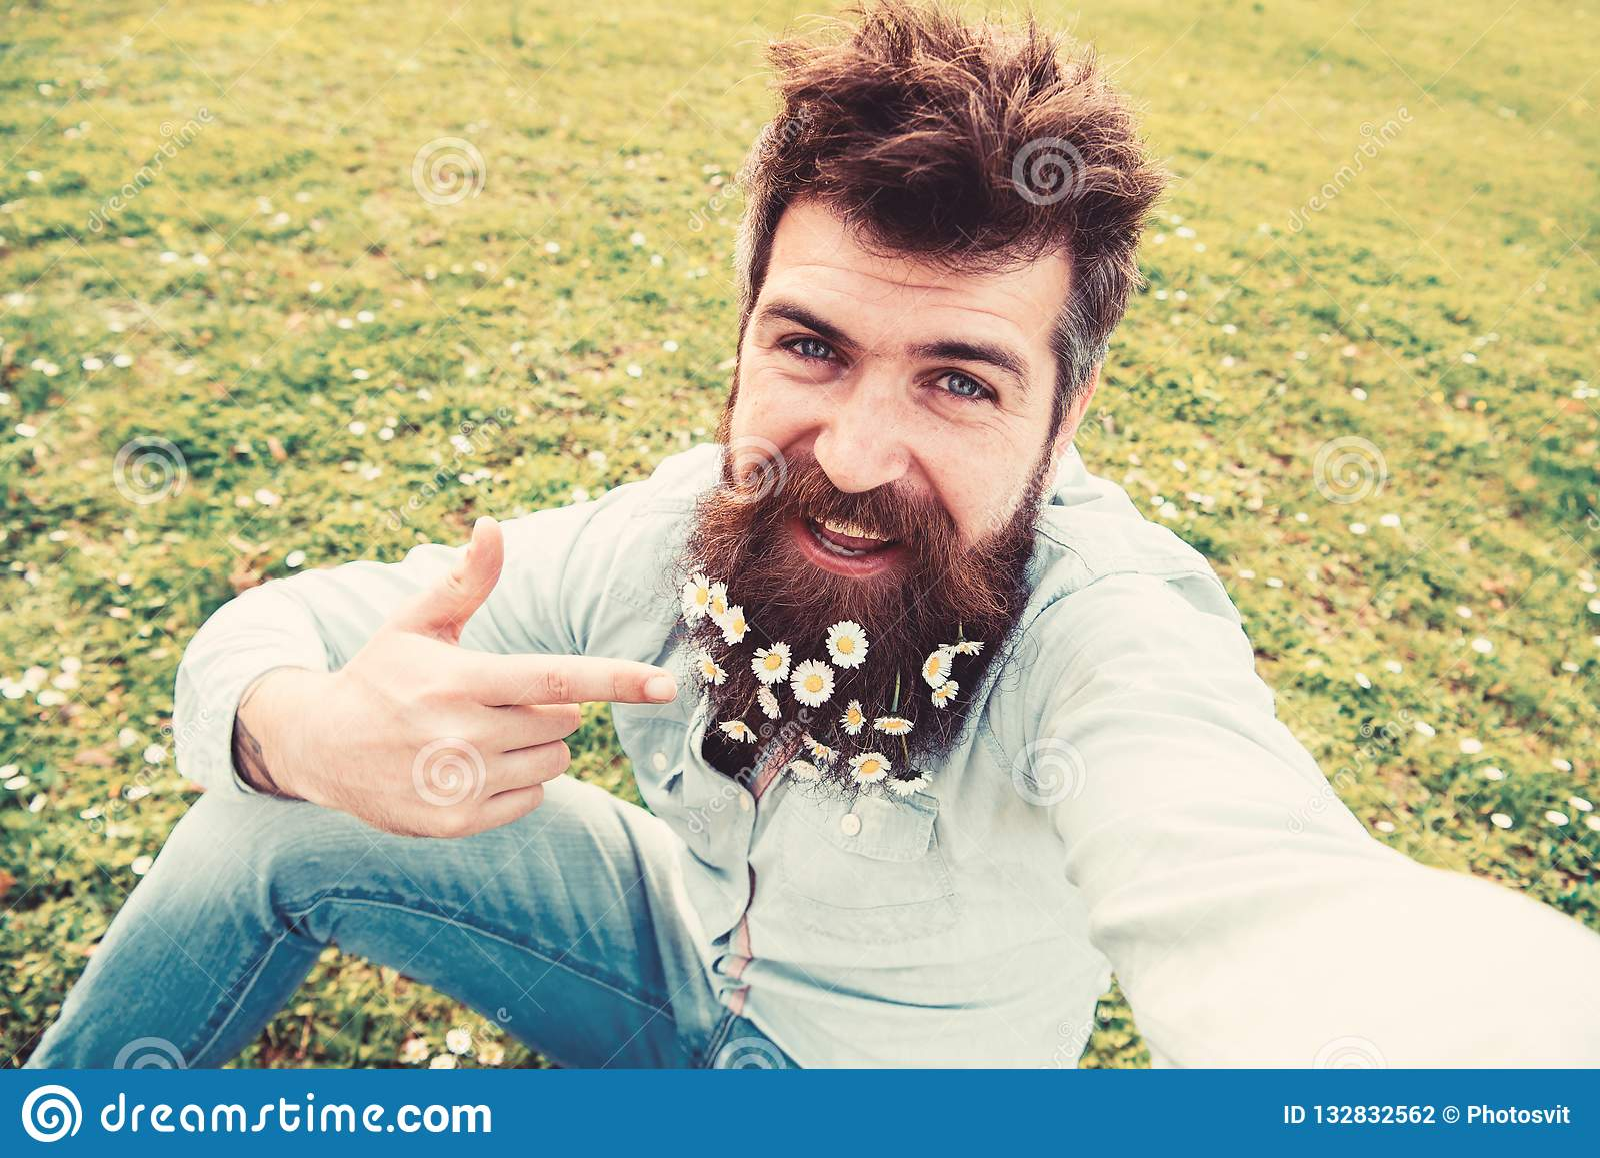 Beard guy selfie with Handsome guy